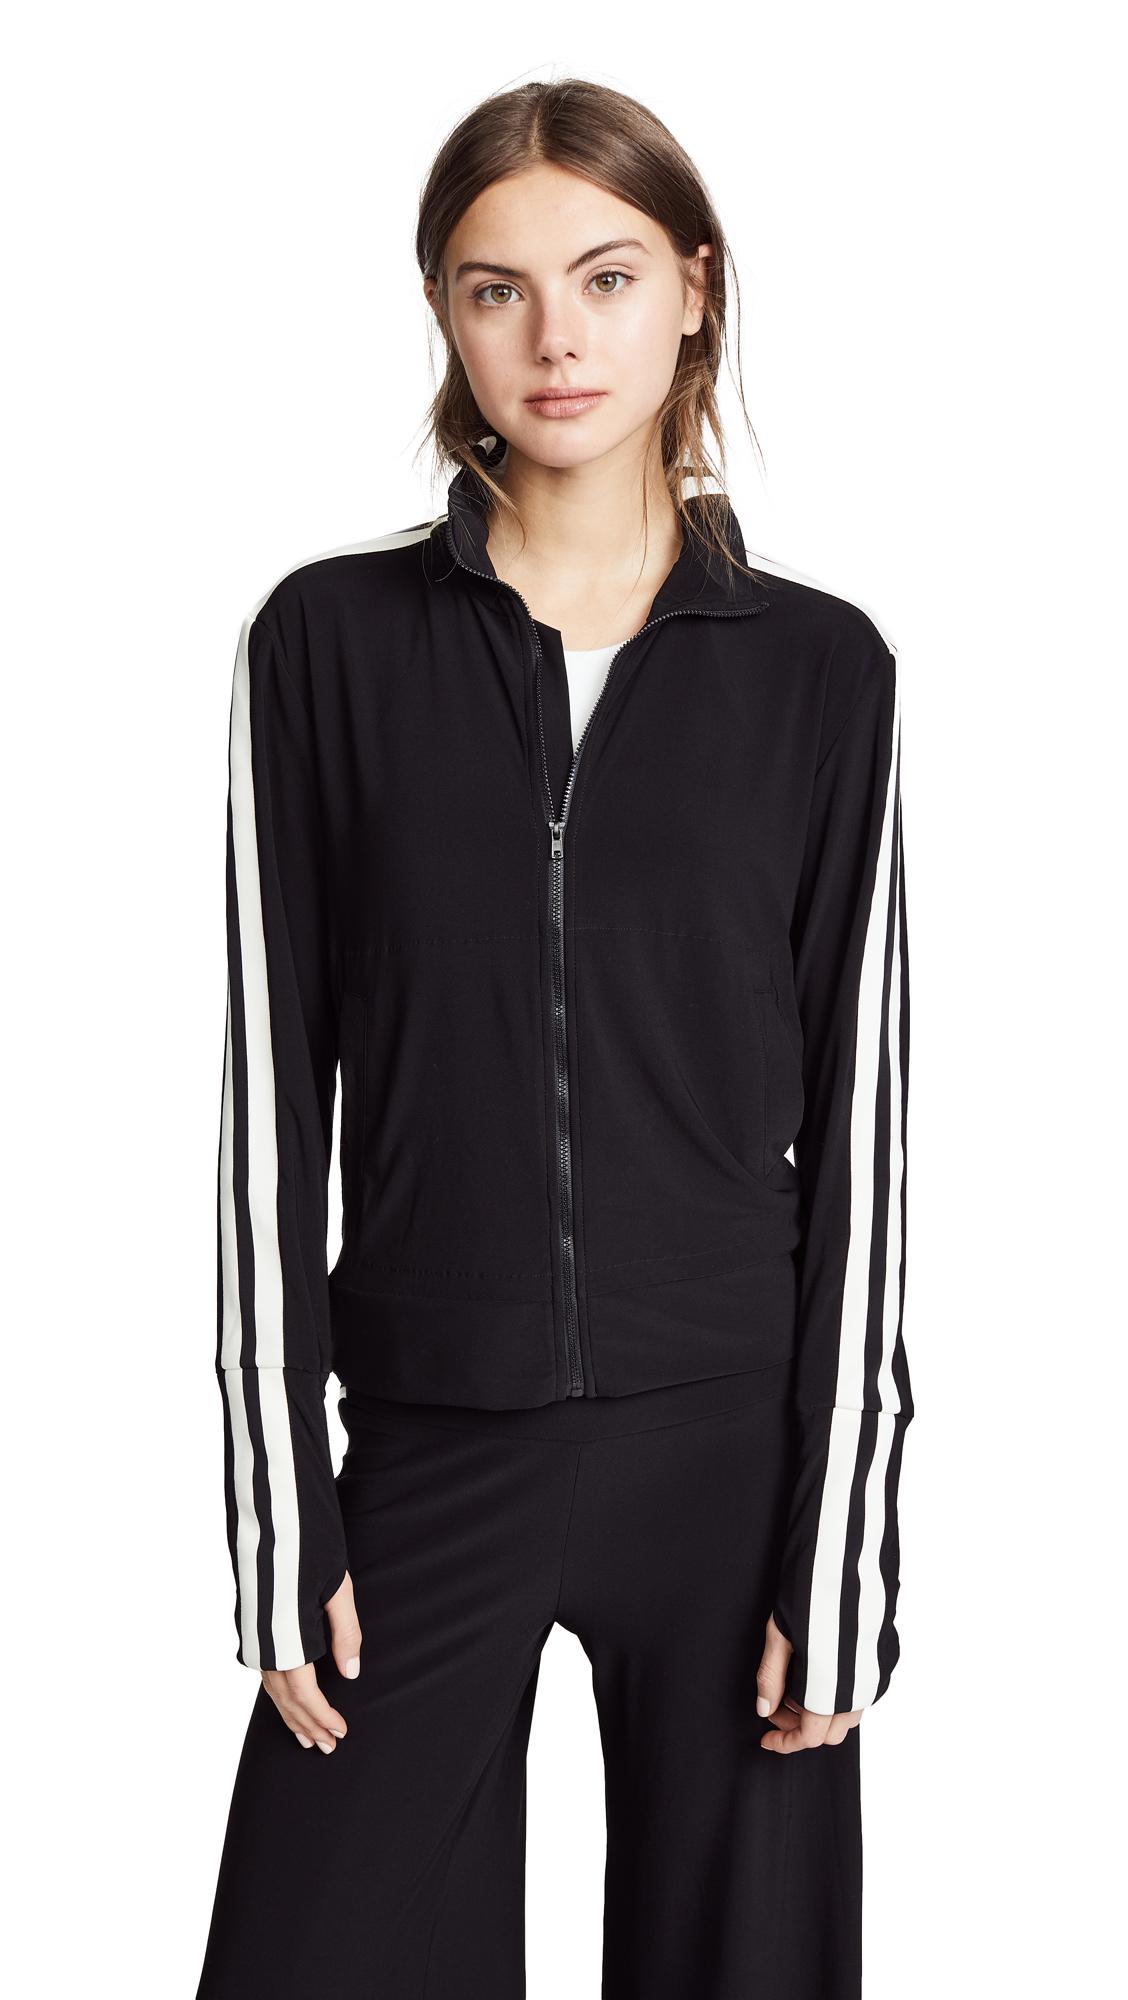 Buy Norma Kamali Side Stripe Turtle Track Jacket online beautiful Norma Kamali Jackets, Coats, Coats